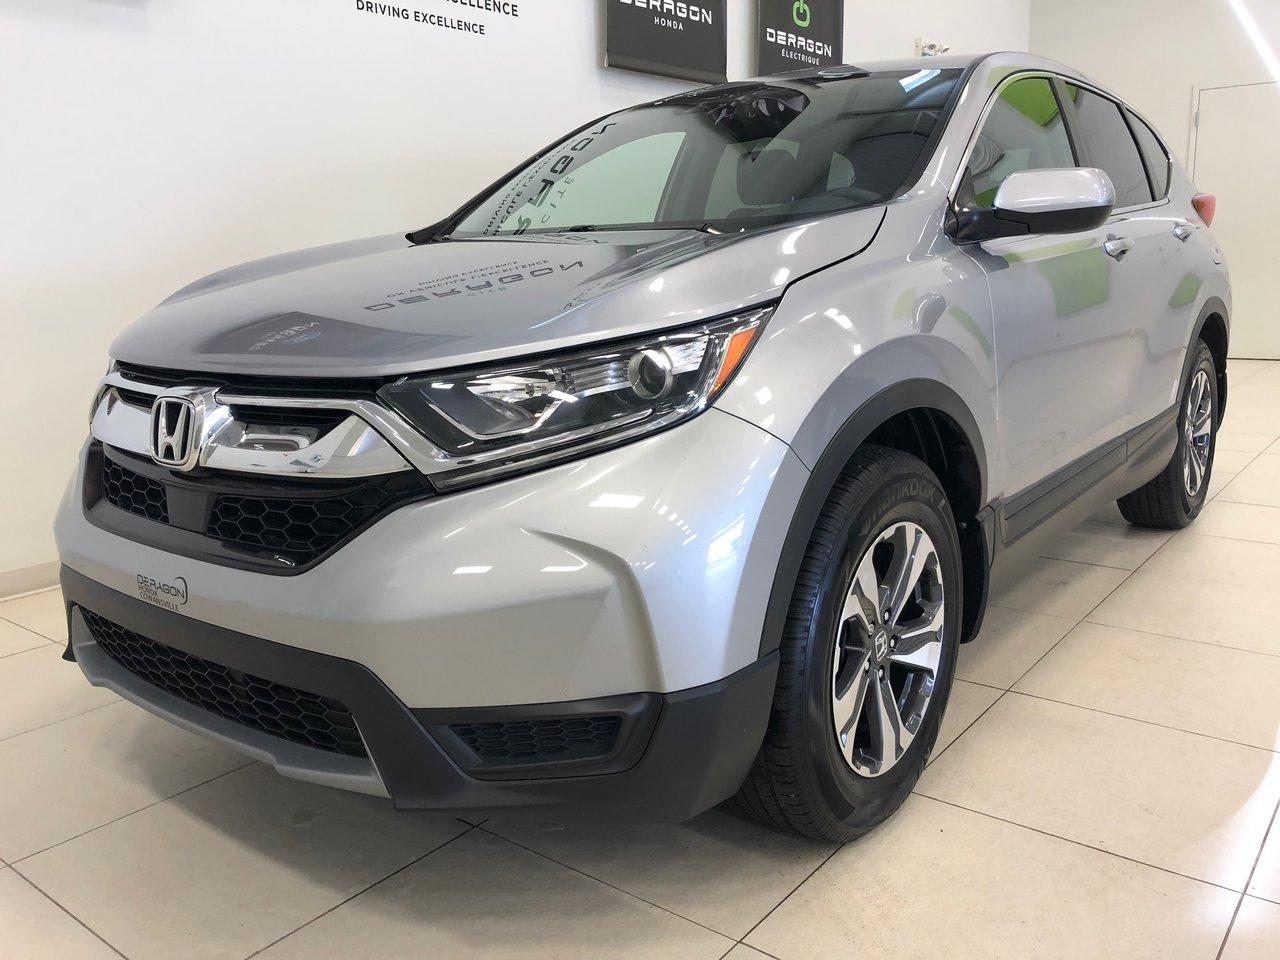 Honda CR-V 2018 LX 1.5L TURBO AWD, HONDA SENSING, DEMARREUR